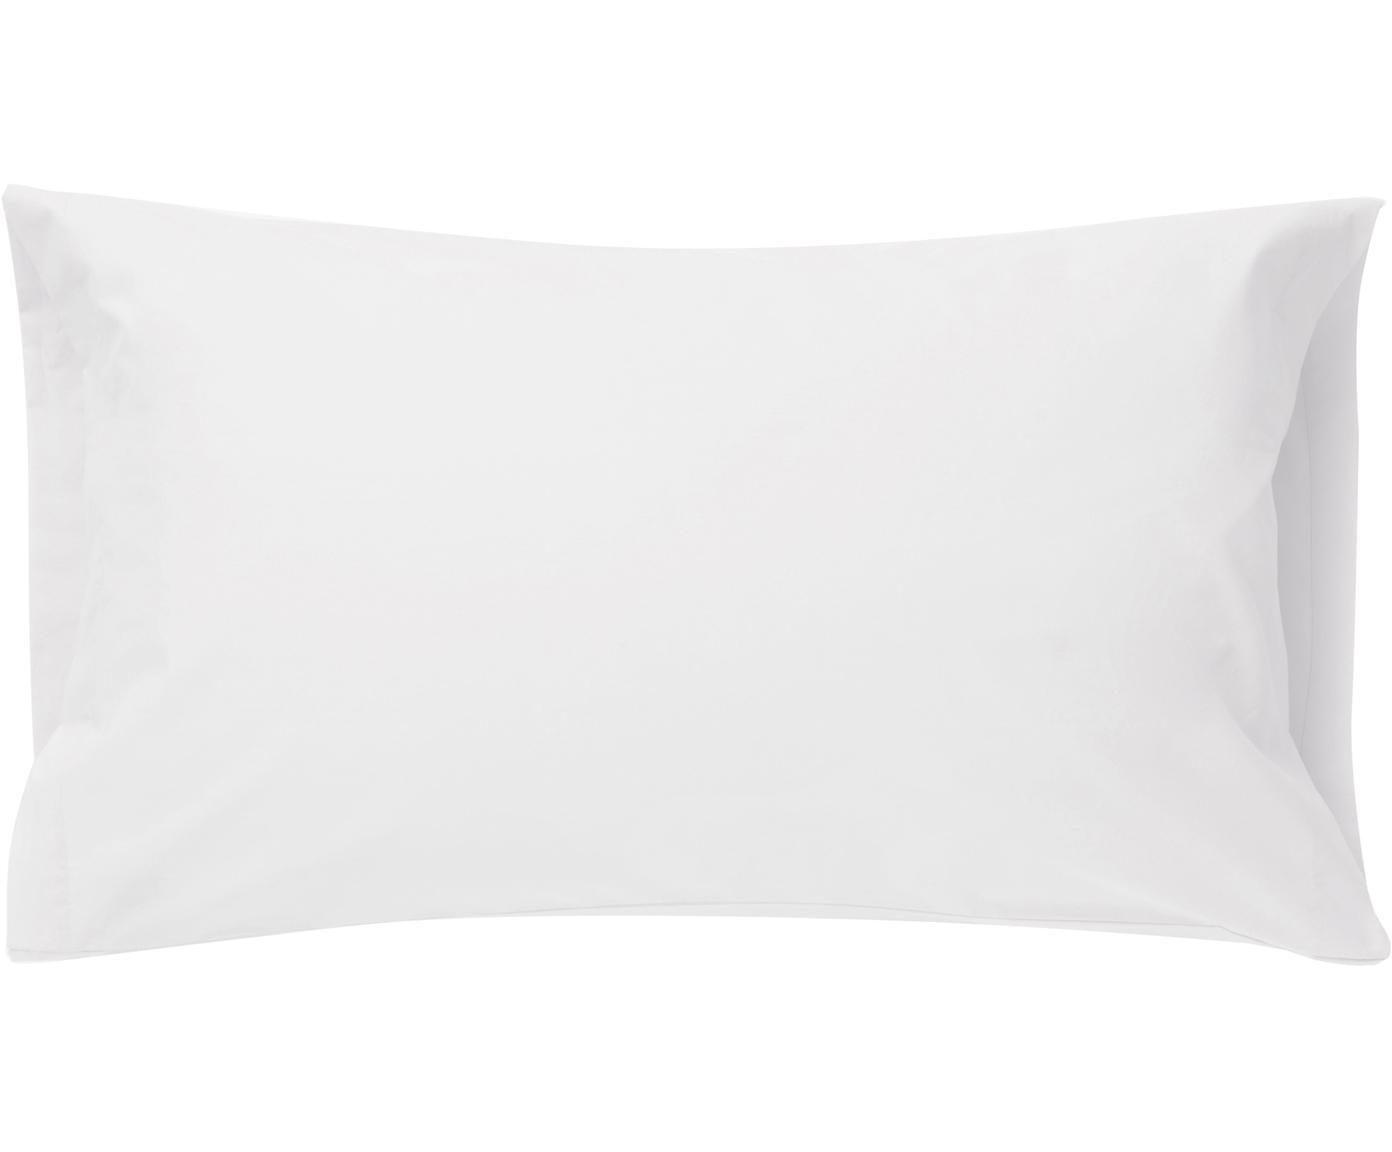 Fundas de almohada Plain Dye, 2uds., Algodón, Blanco, An 50 x L 85 cm